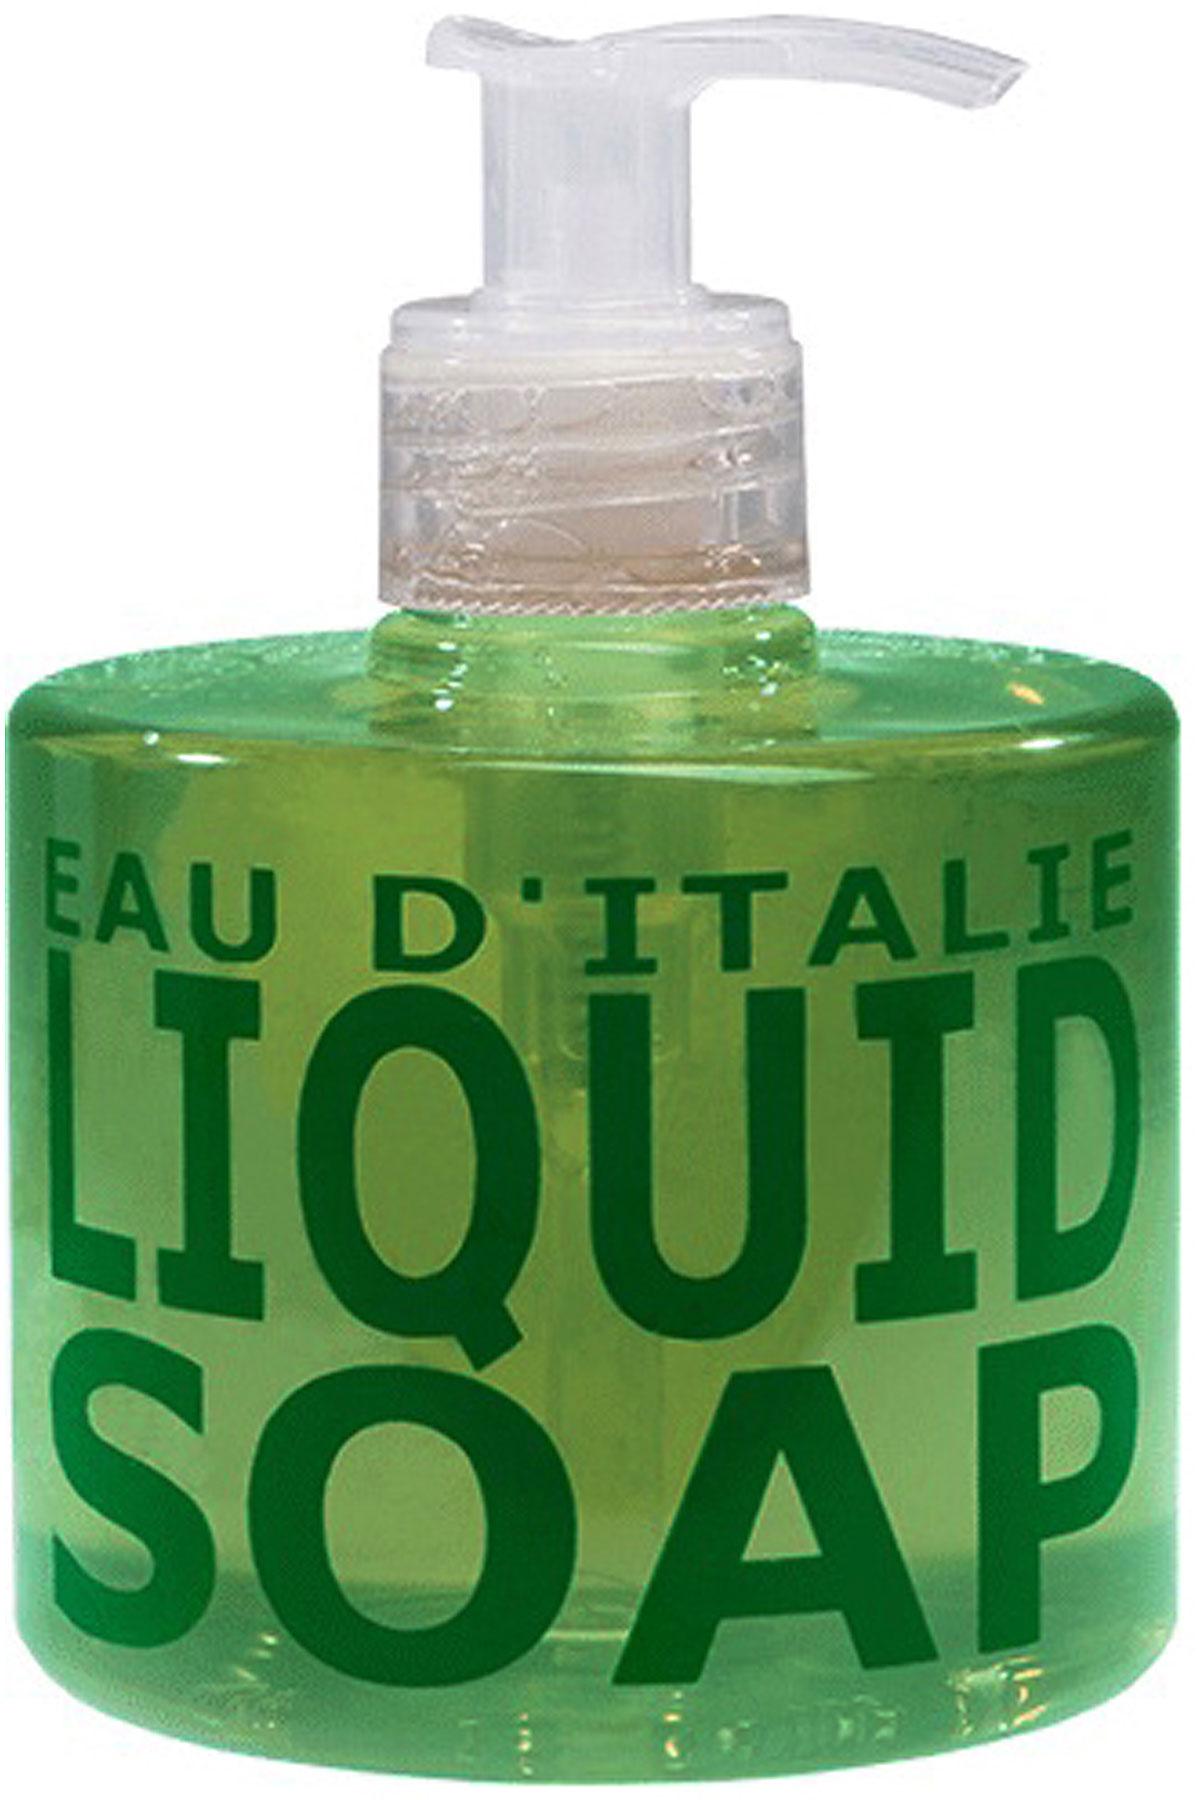 Eau D Italie Beauty for Women, Eau D Italie - Liquid Soap - 300 Ml, 2019, 300 ml